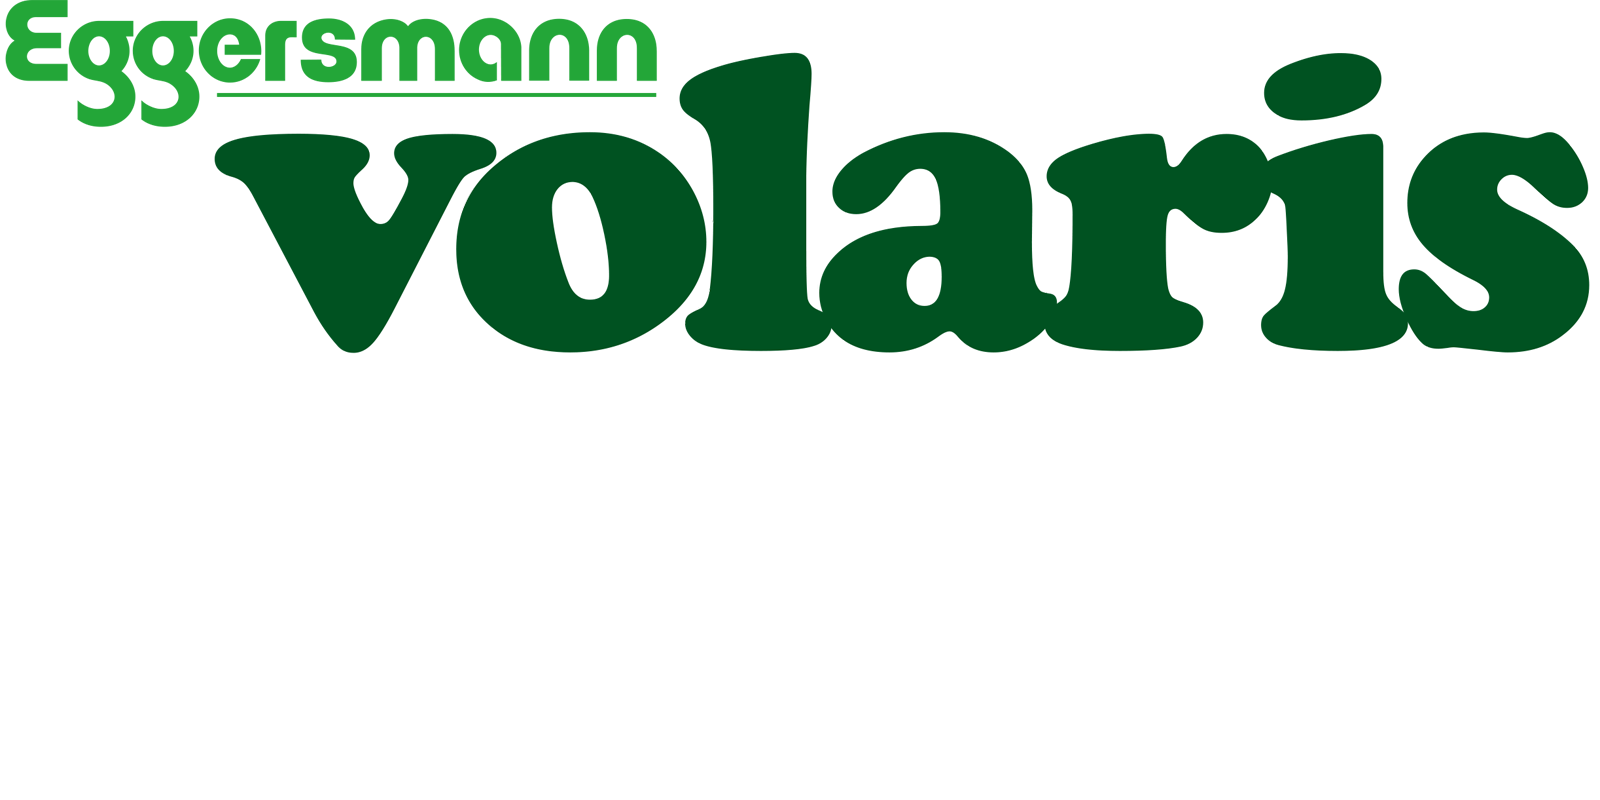 Eggersmann volaris